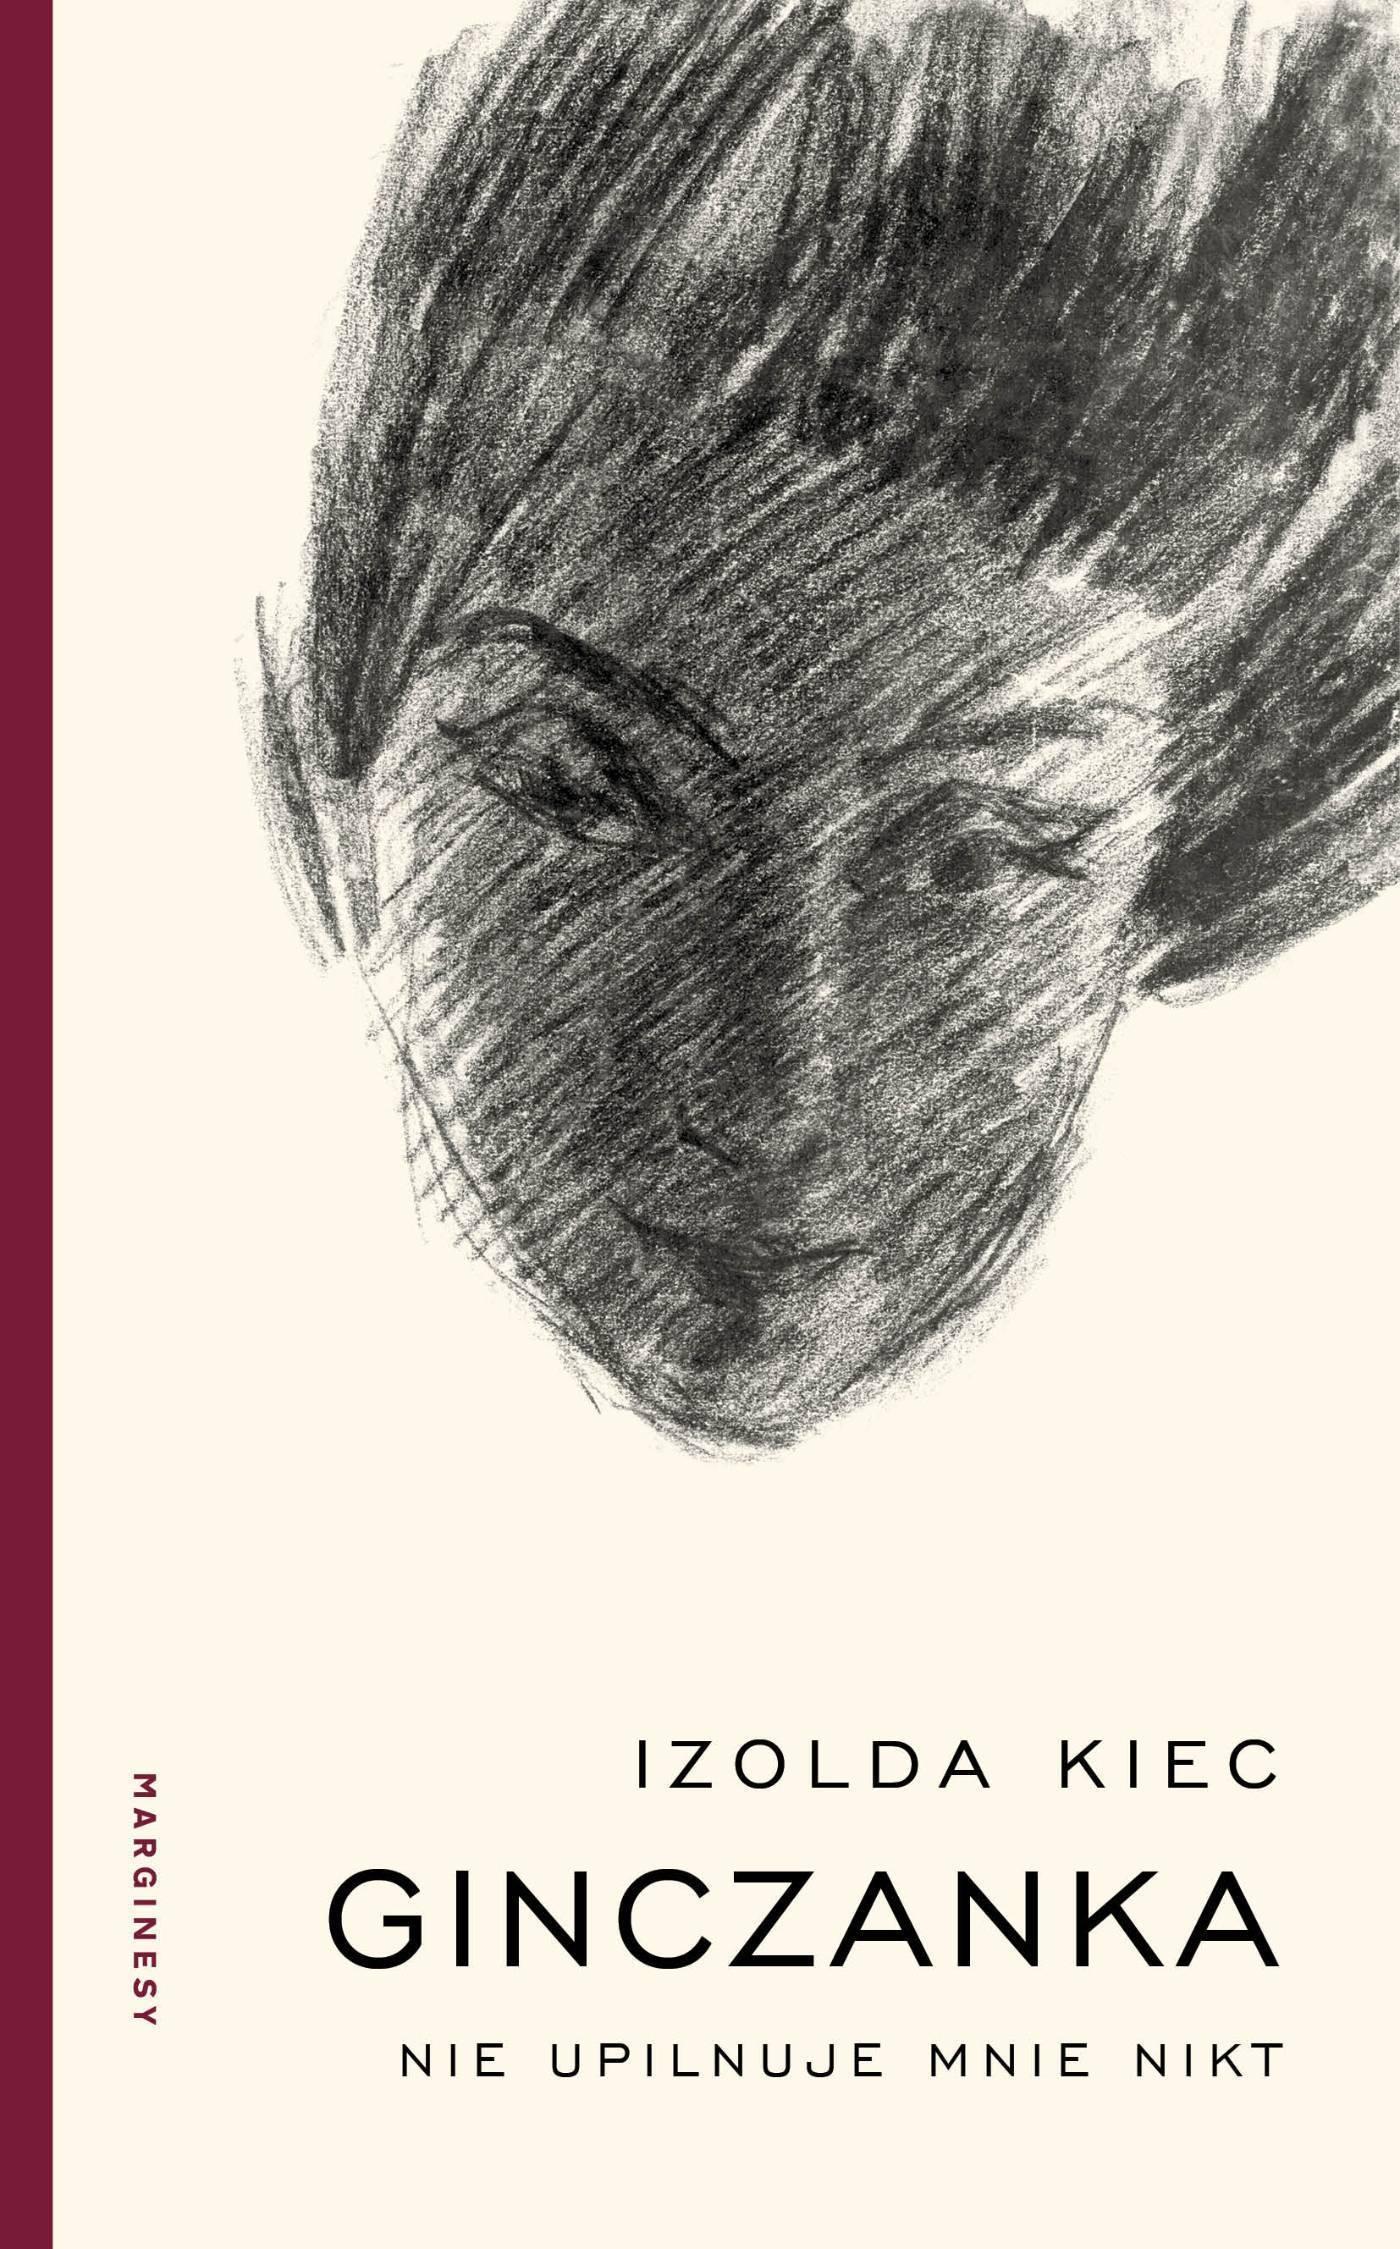 Izolda Kiec - Ginczanka